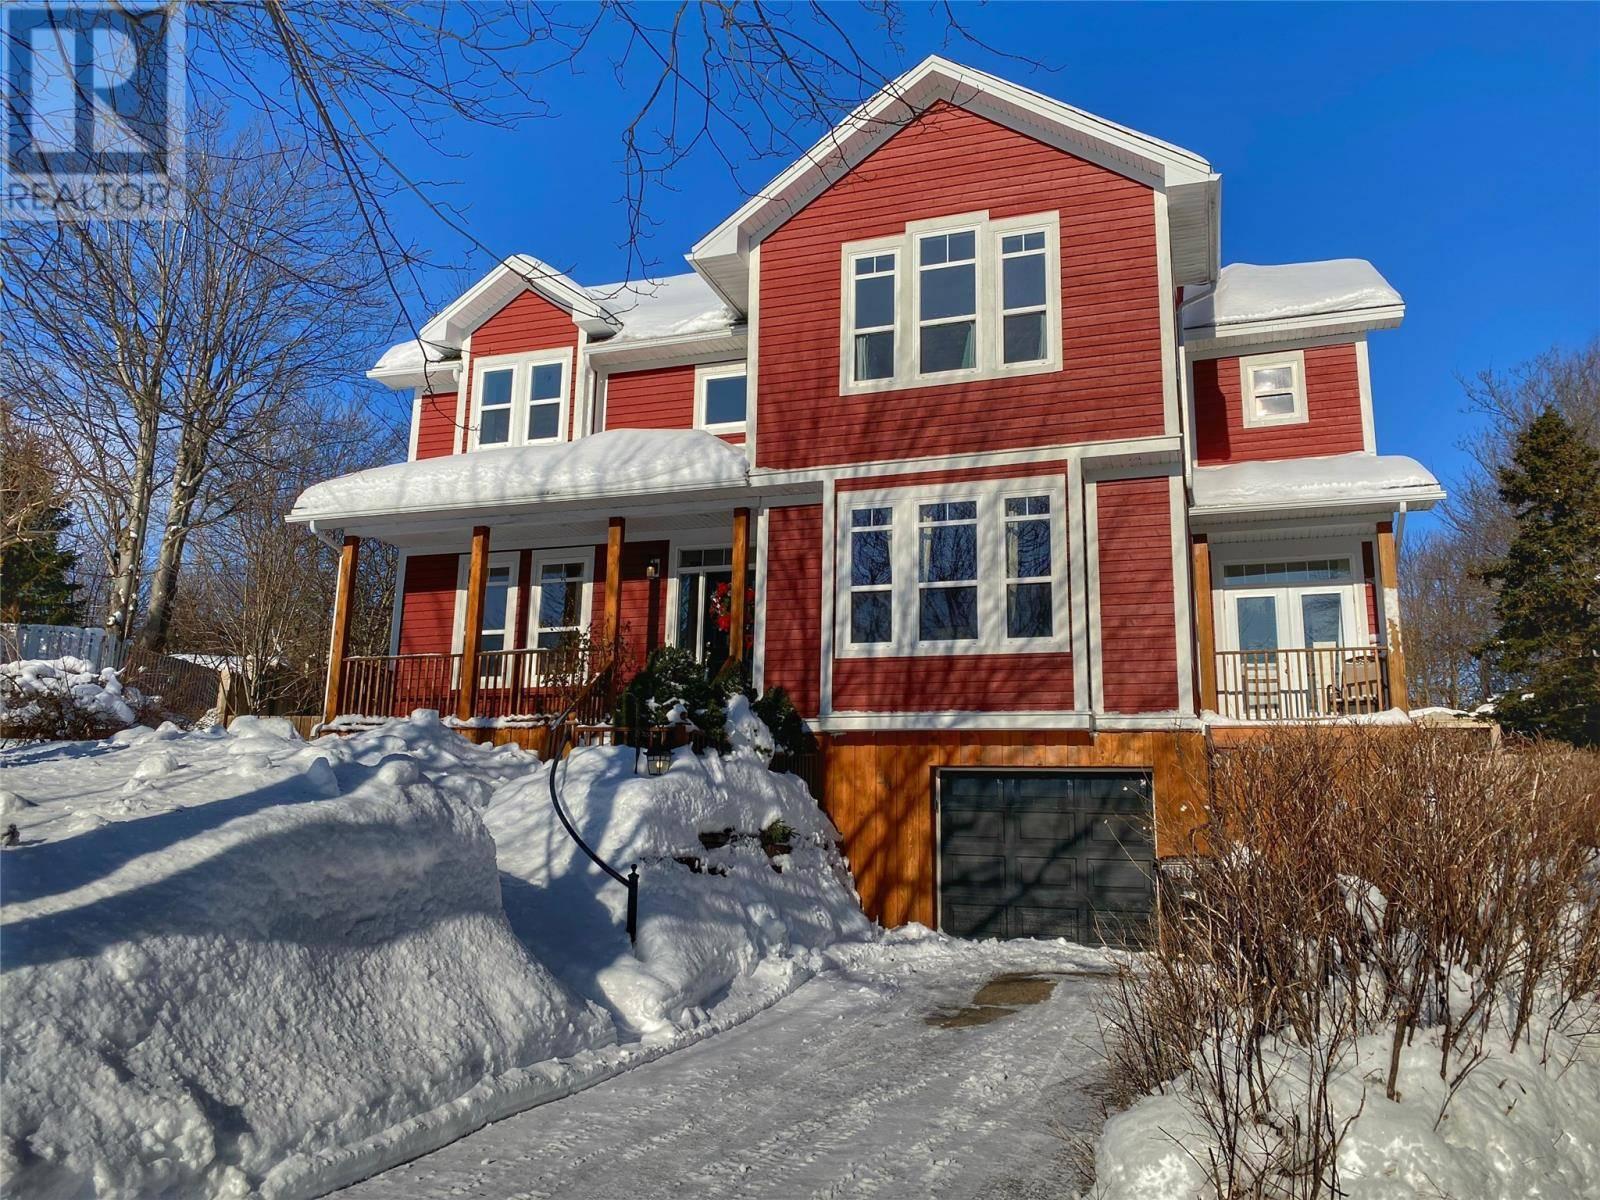 House for sale at 16 Pine Bud Pl St. John's Newfoundland - MLS: 1209675